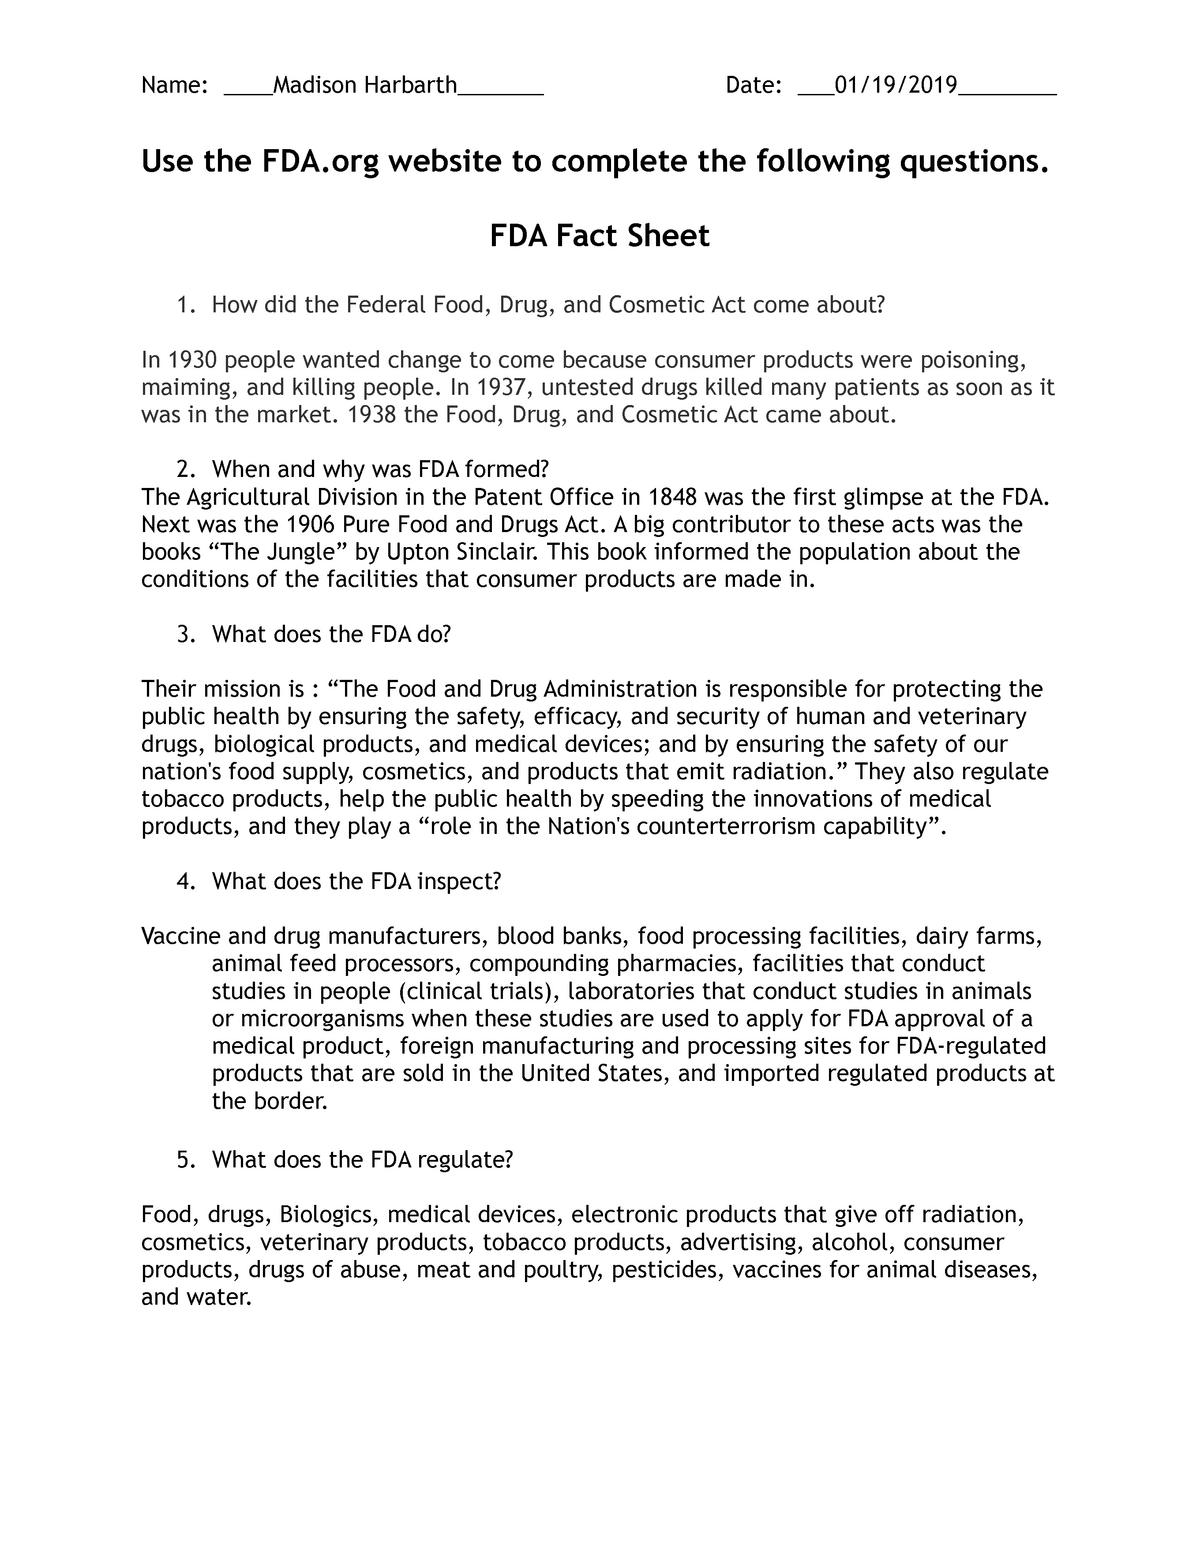 FDA Fact Sheet - NRSE 3350: Nursing Informatics and